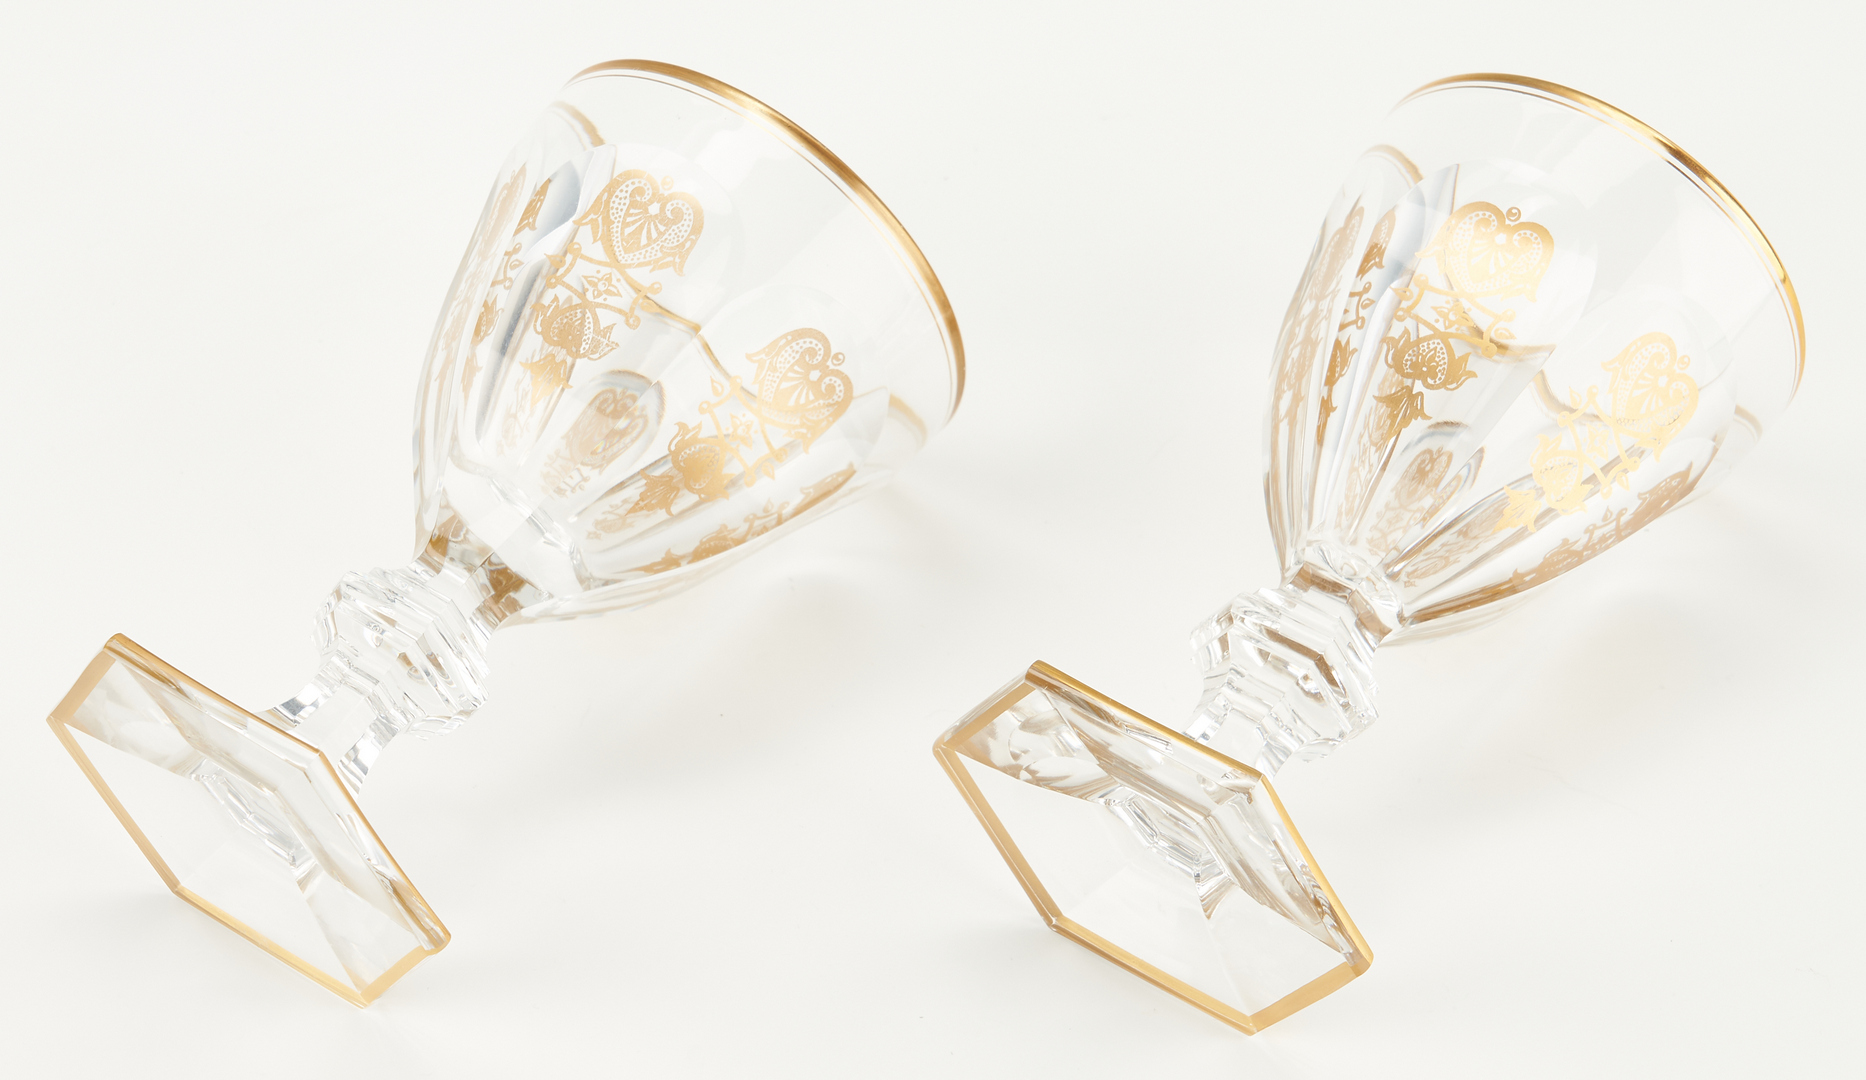 Lot 960: 6 Baccarat Empire Pattern Goblets